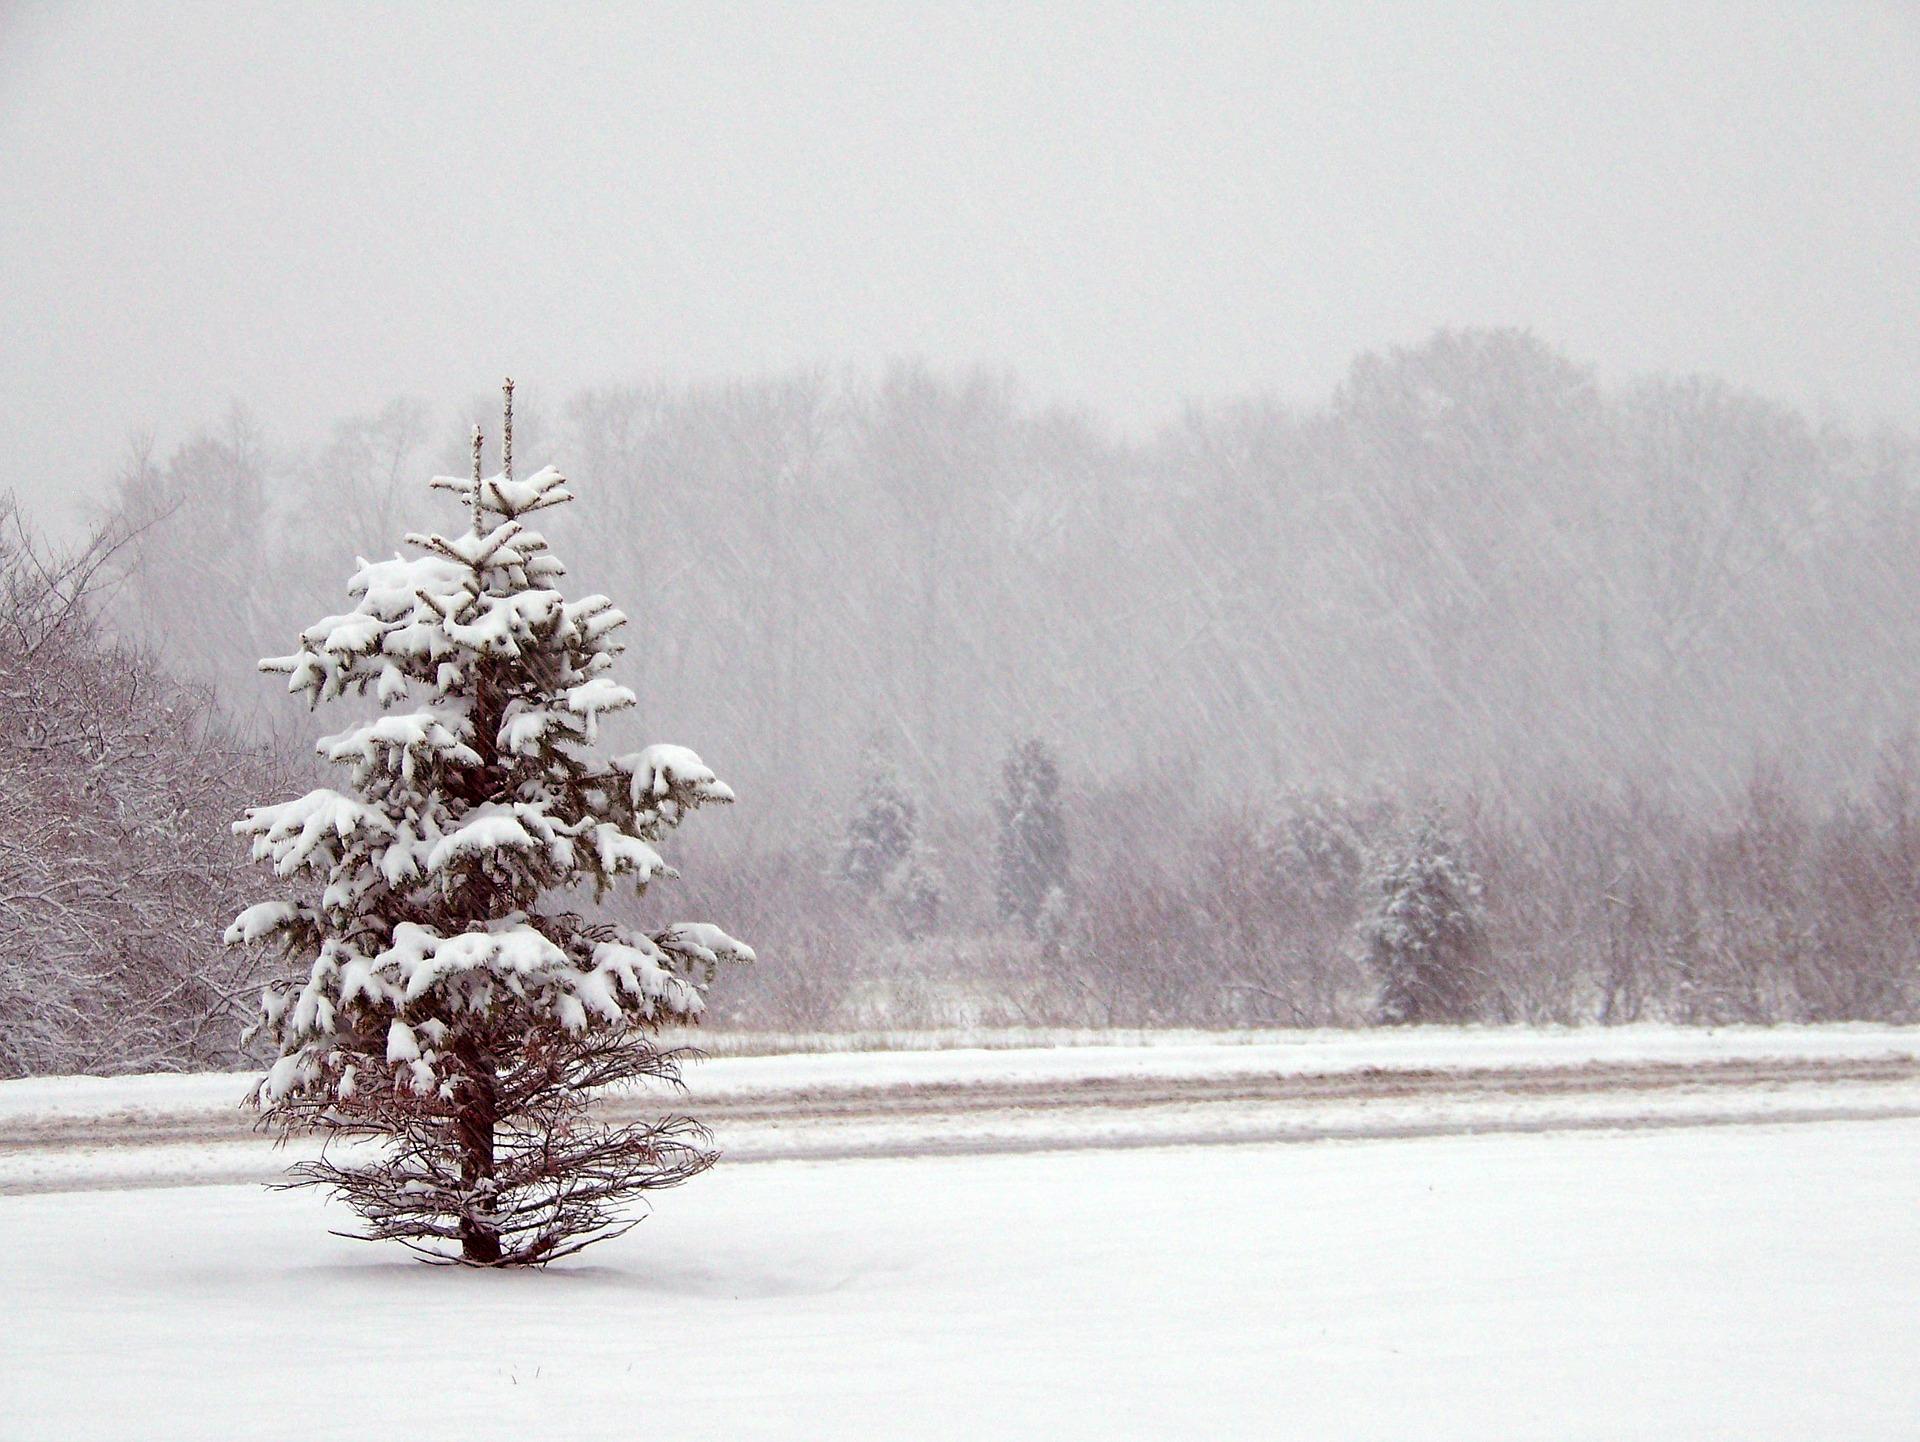 Komunikat 16/2020 – opady śniegu